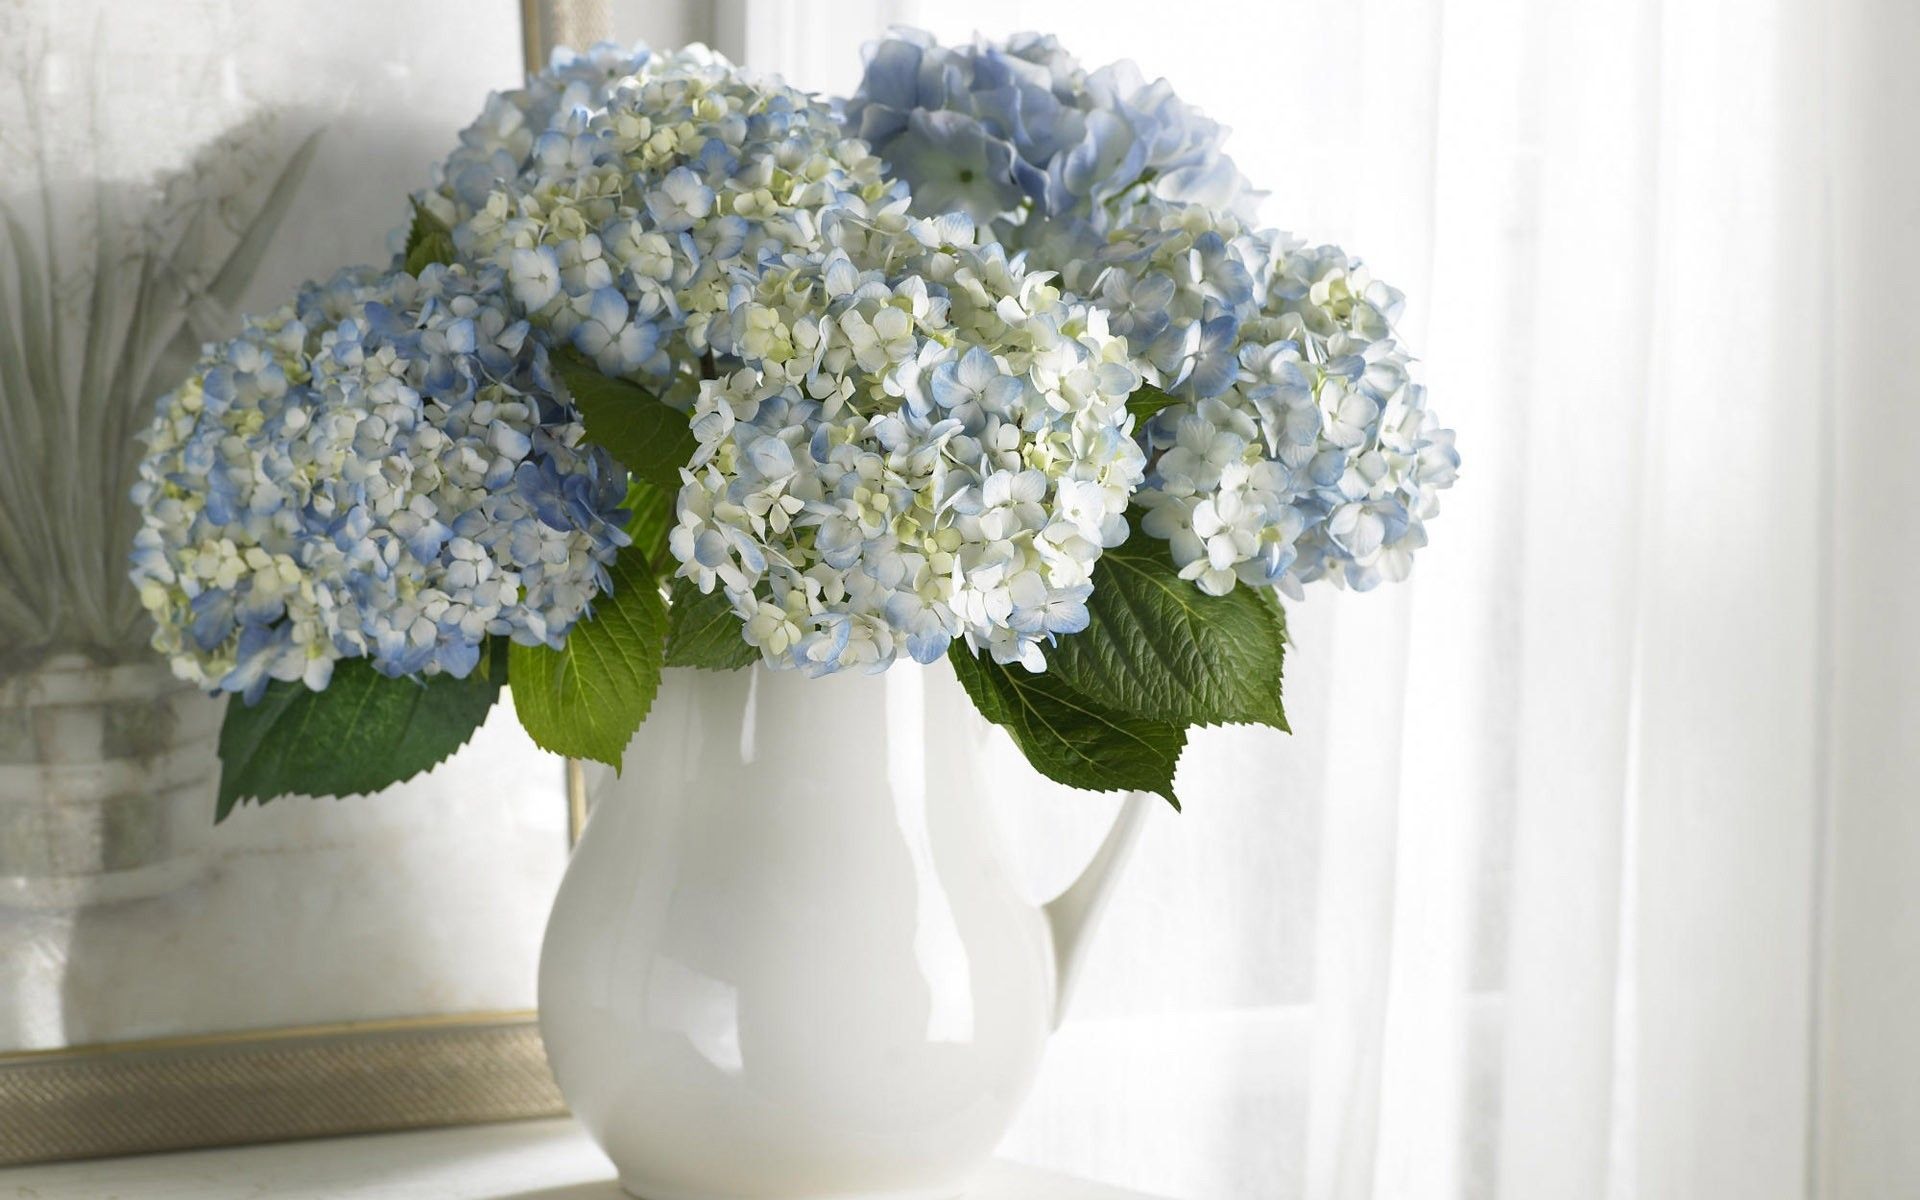 Flower vase licac bouquet flowers white blue cleanliness flower vase licac bouquet flowers white blue cleanliness reviewsmspy